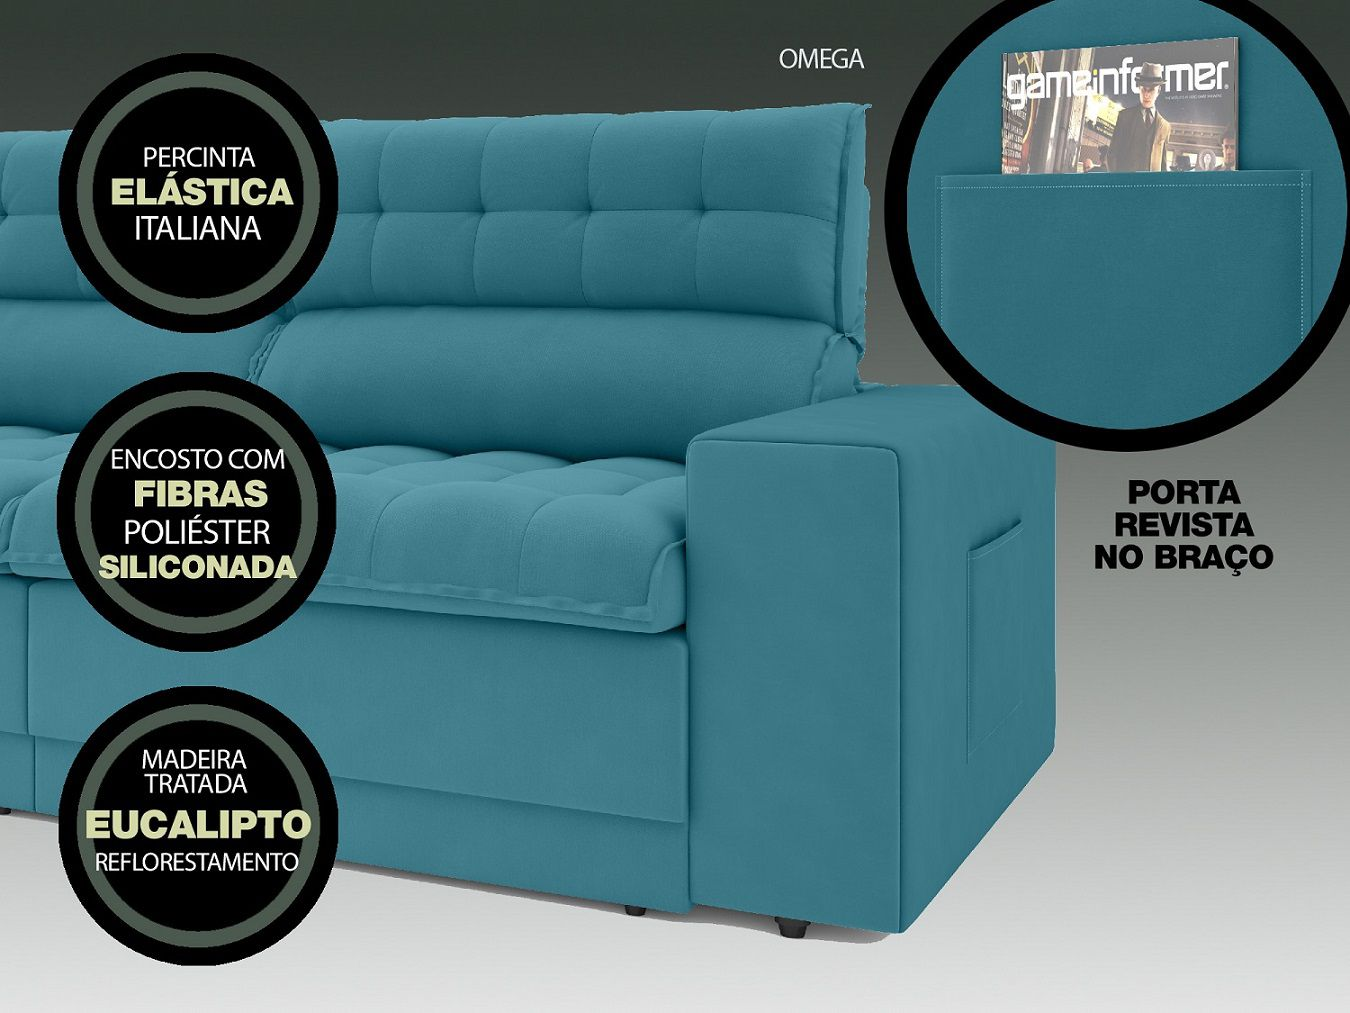 Sofá Omega 2,30m Assento Retrátil e Reclinável Velosuede Turquesa - NETSOFAS  - NETSOFÁS